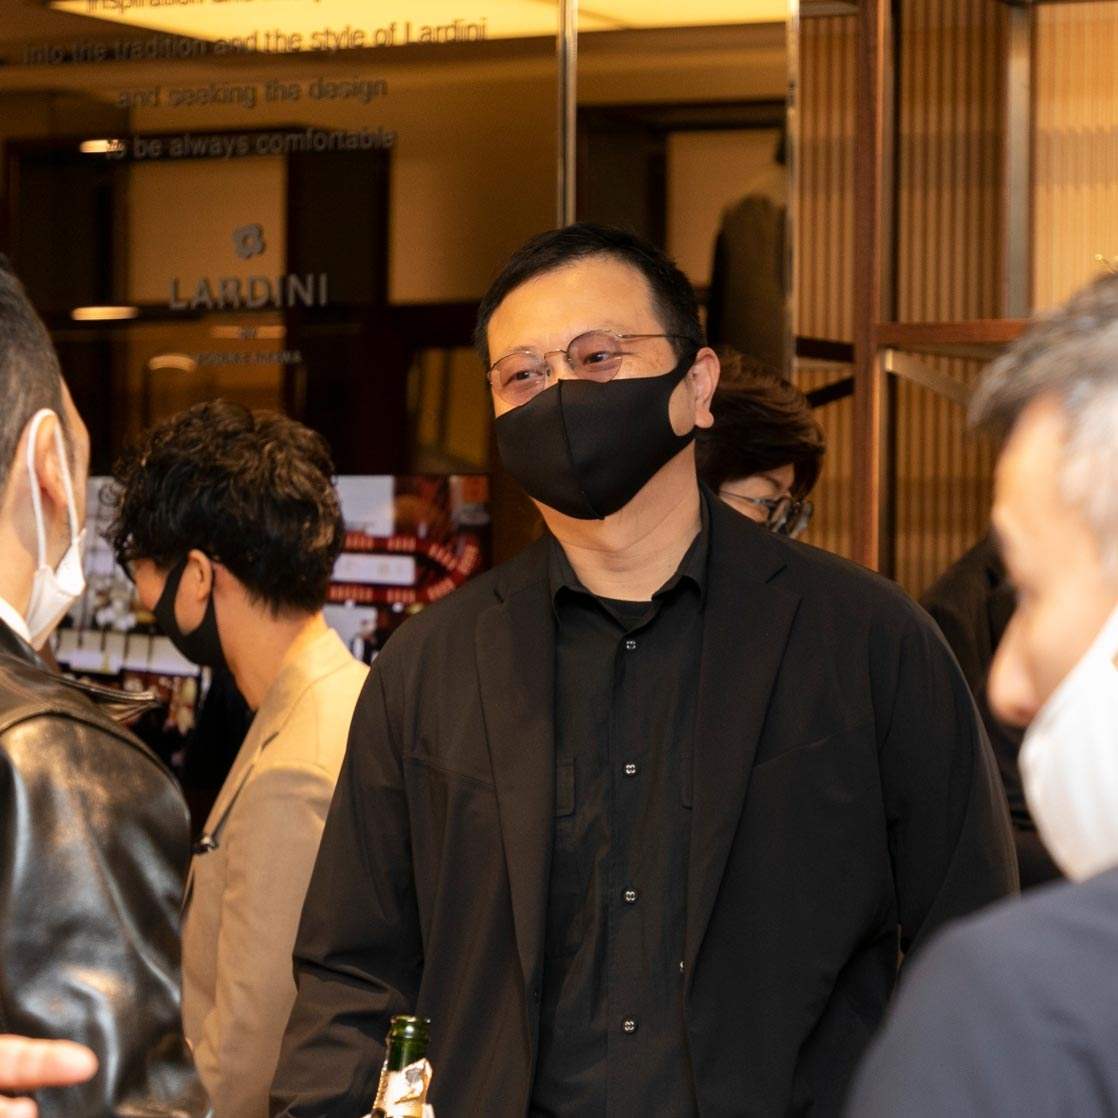 lardini_by_yosukeaizawa_event_3.jpg